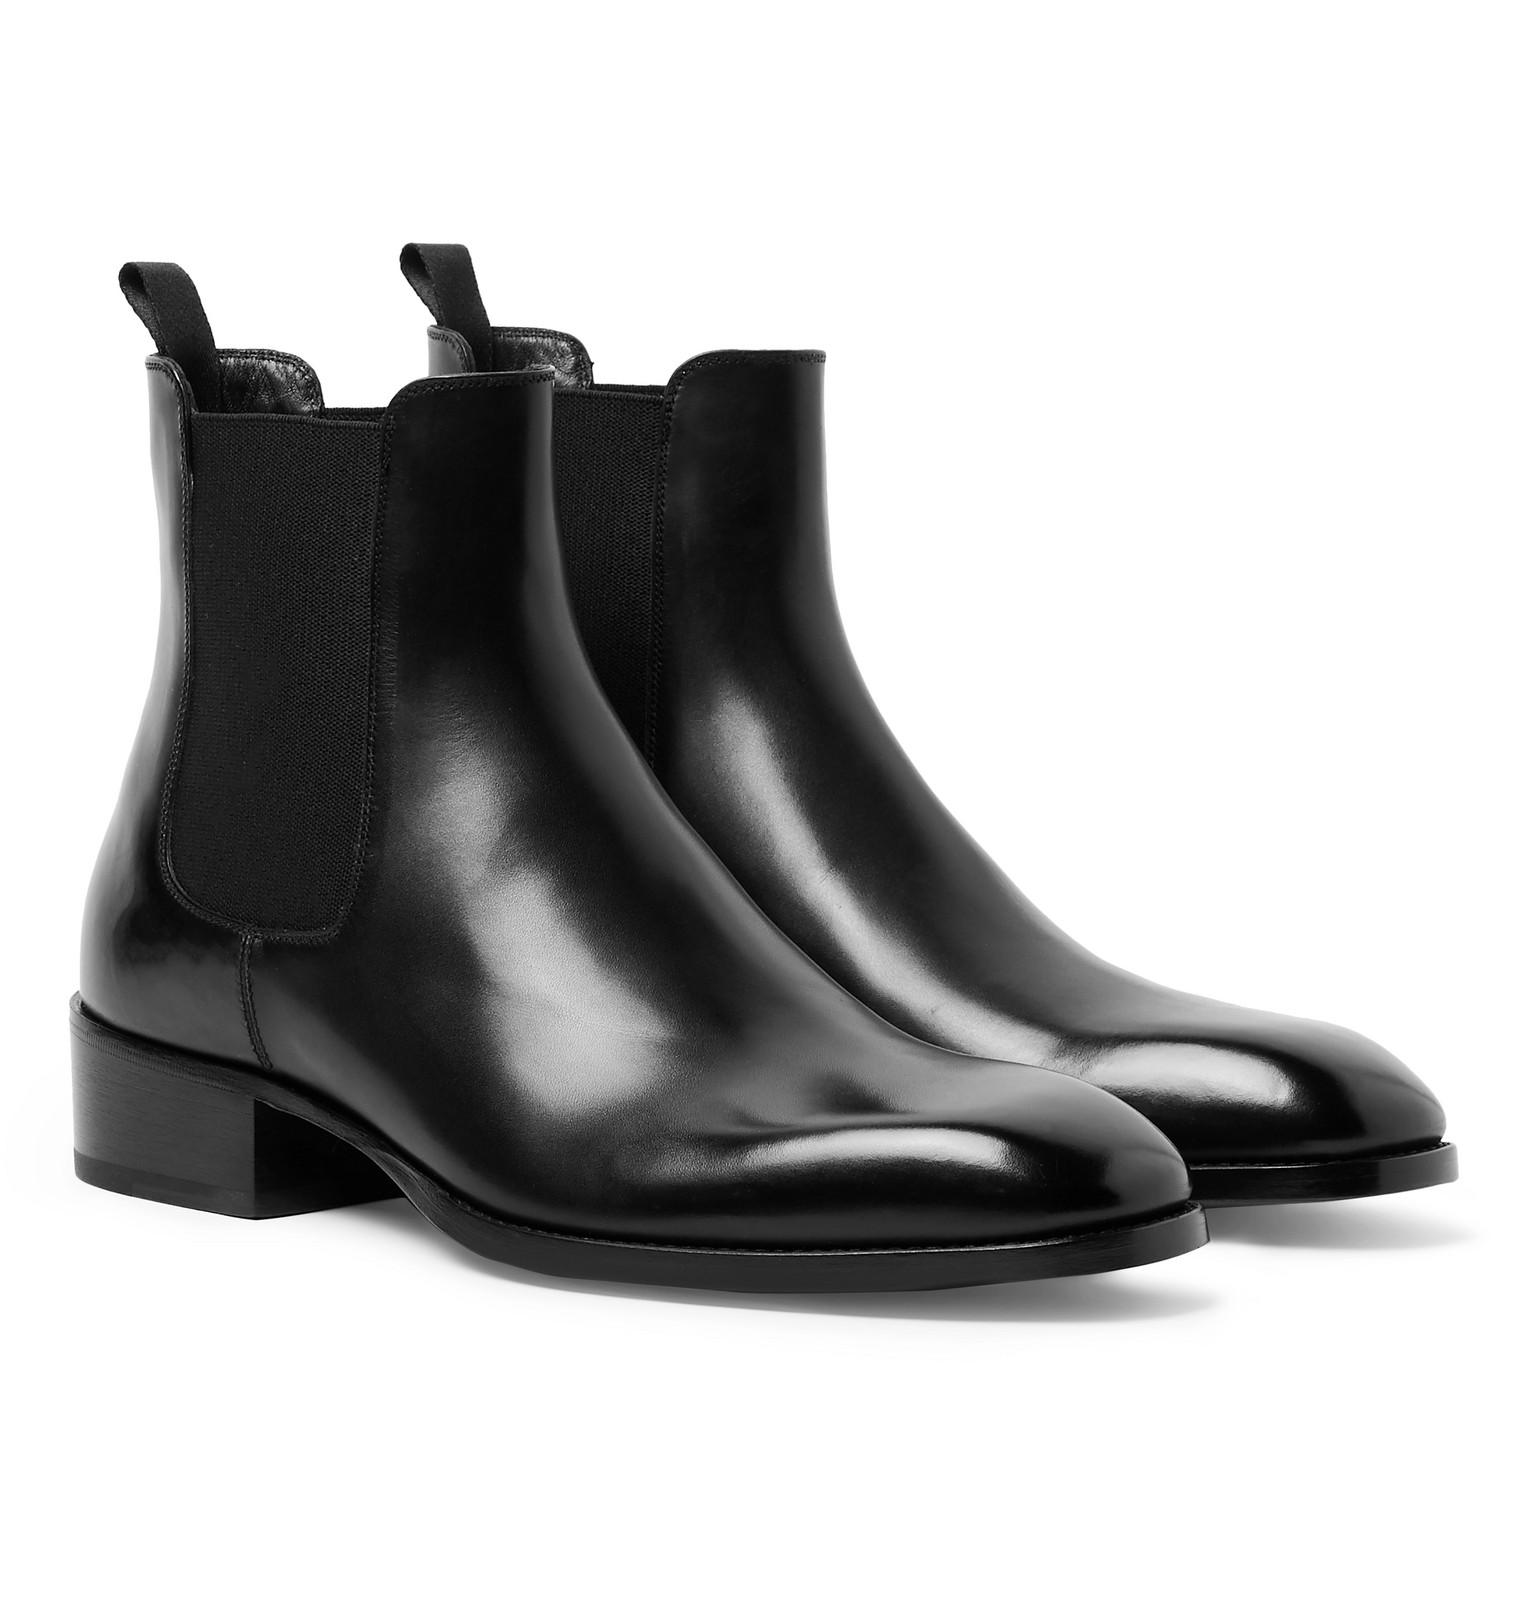 Hainaut Polished-Leather Chelsea Boots